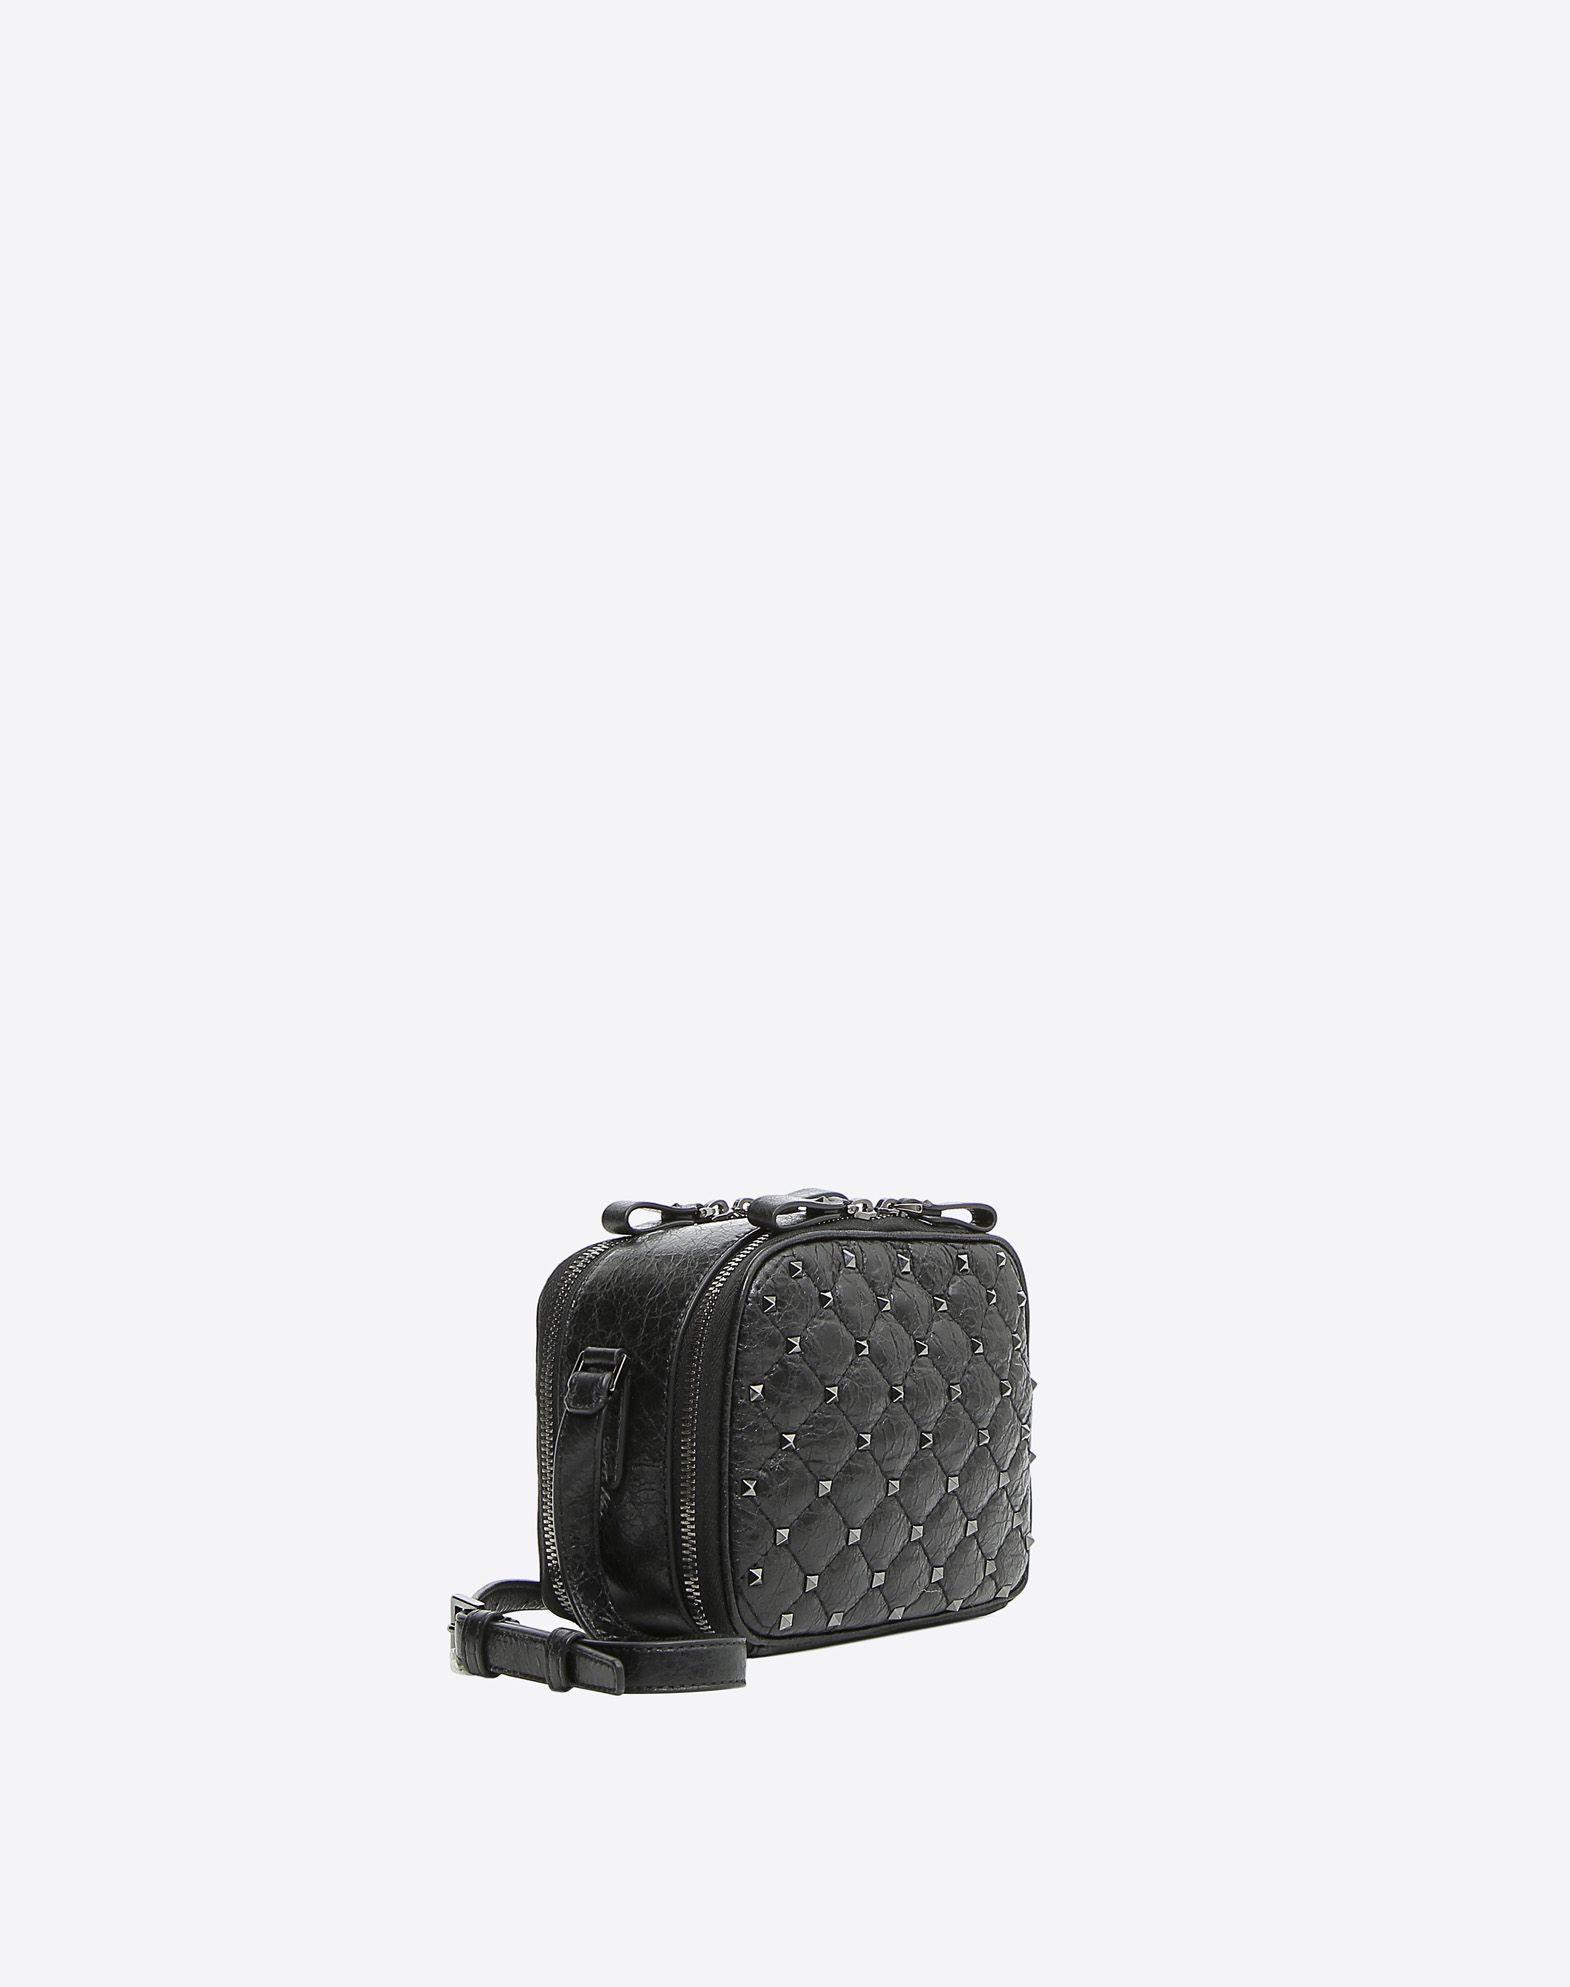 VALENTINO GARAVANI Rockstud Spike 相机包 肩背包 D r